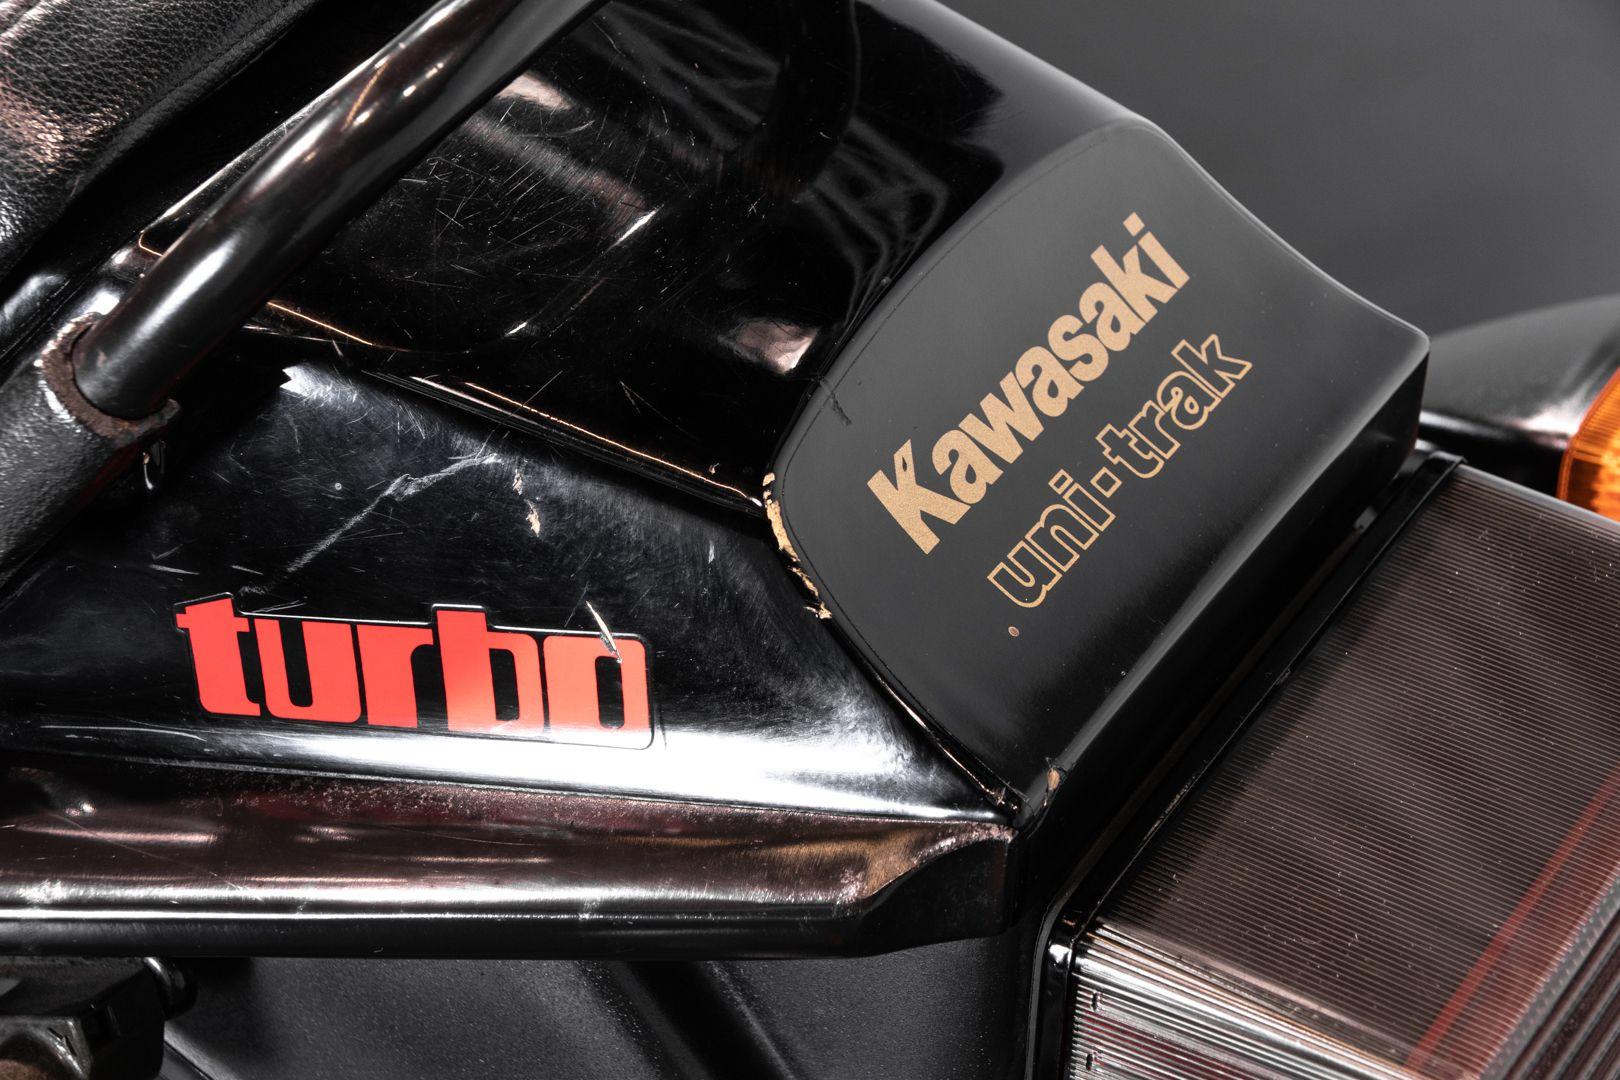 1985 Kawasaki Turbo 750 84980